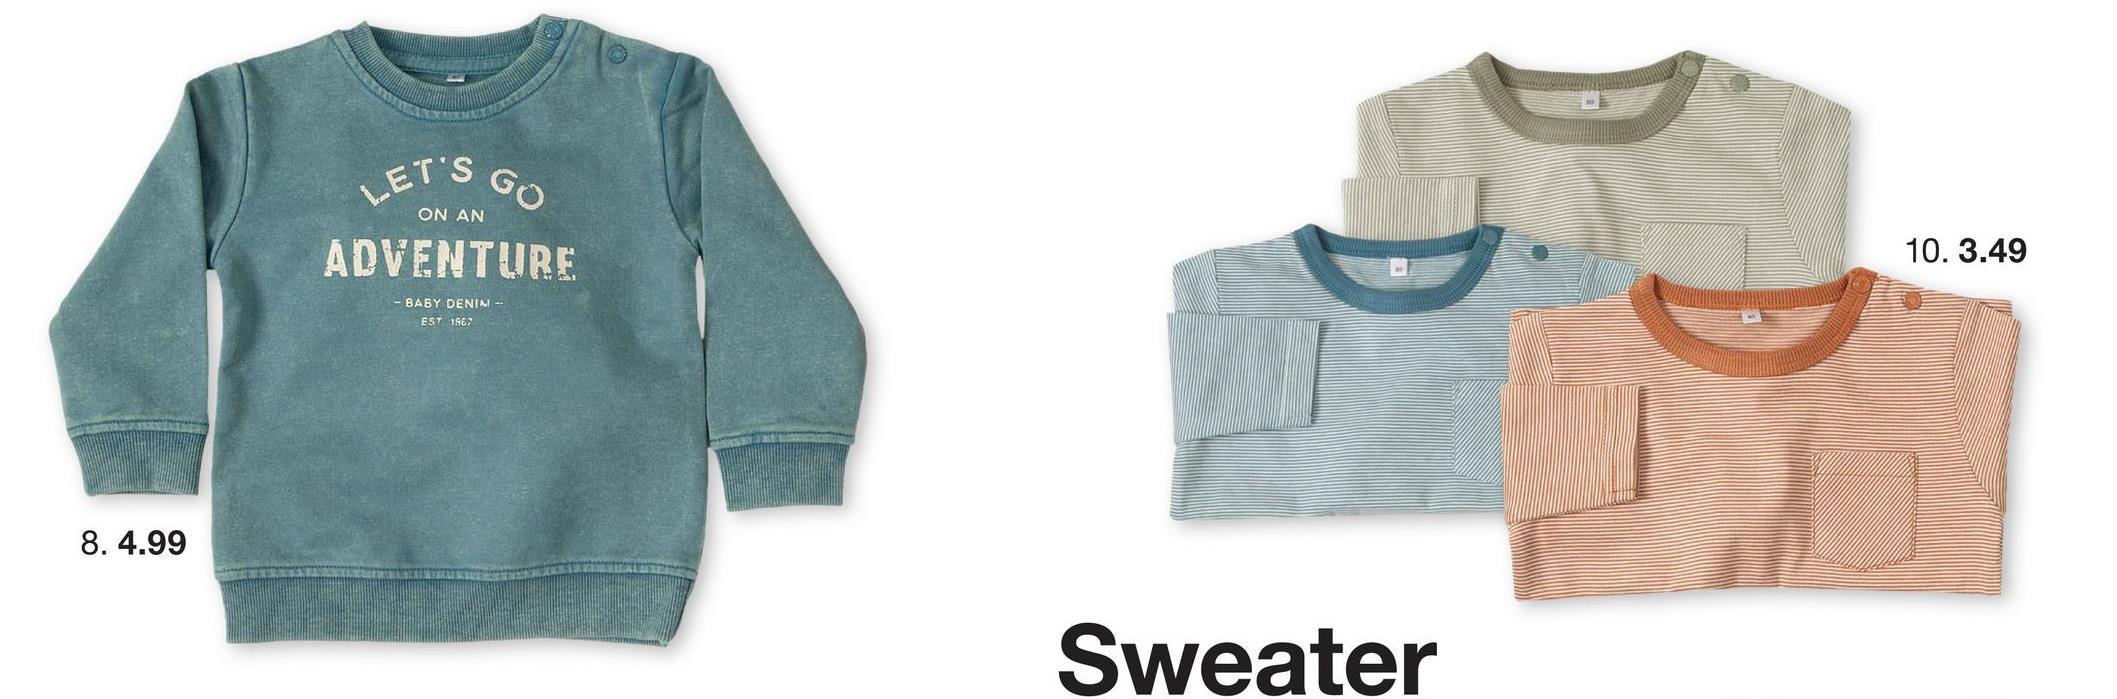 ET'S GO ON AN ADVENTURE 10.3.49 BABY DENIM EST 1862 8. 4.99 Sweater